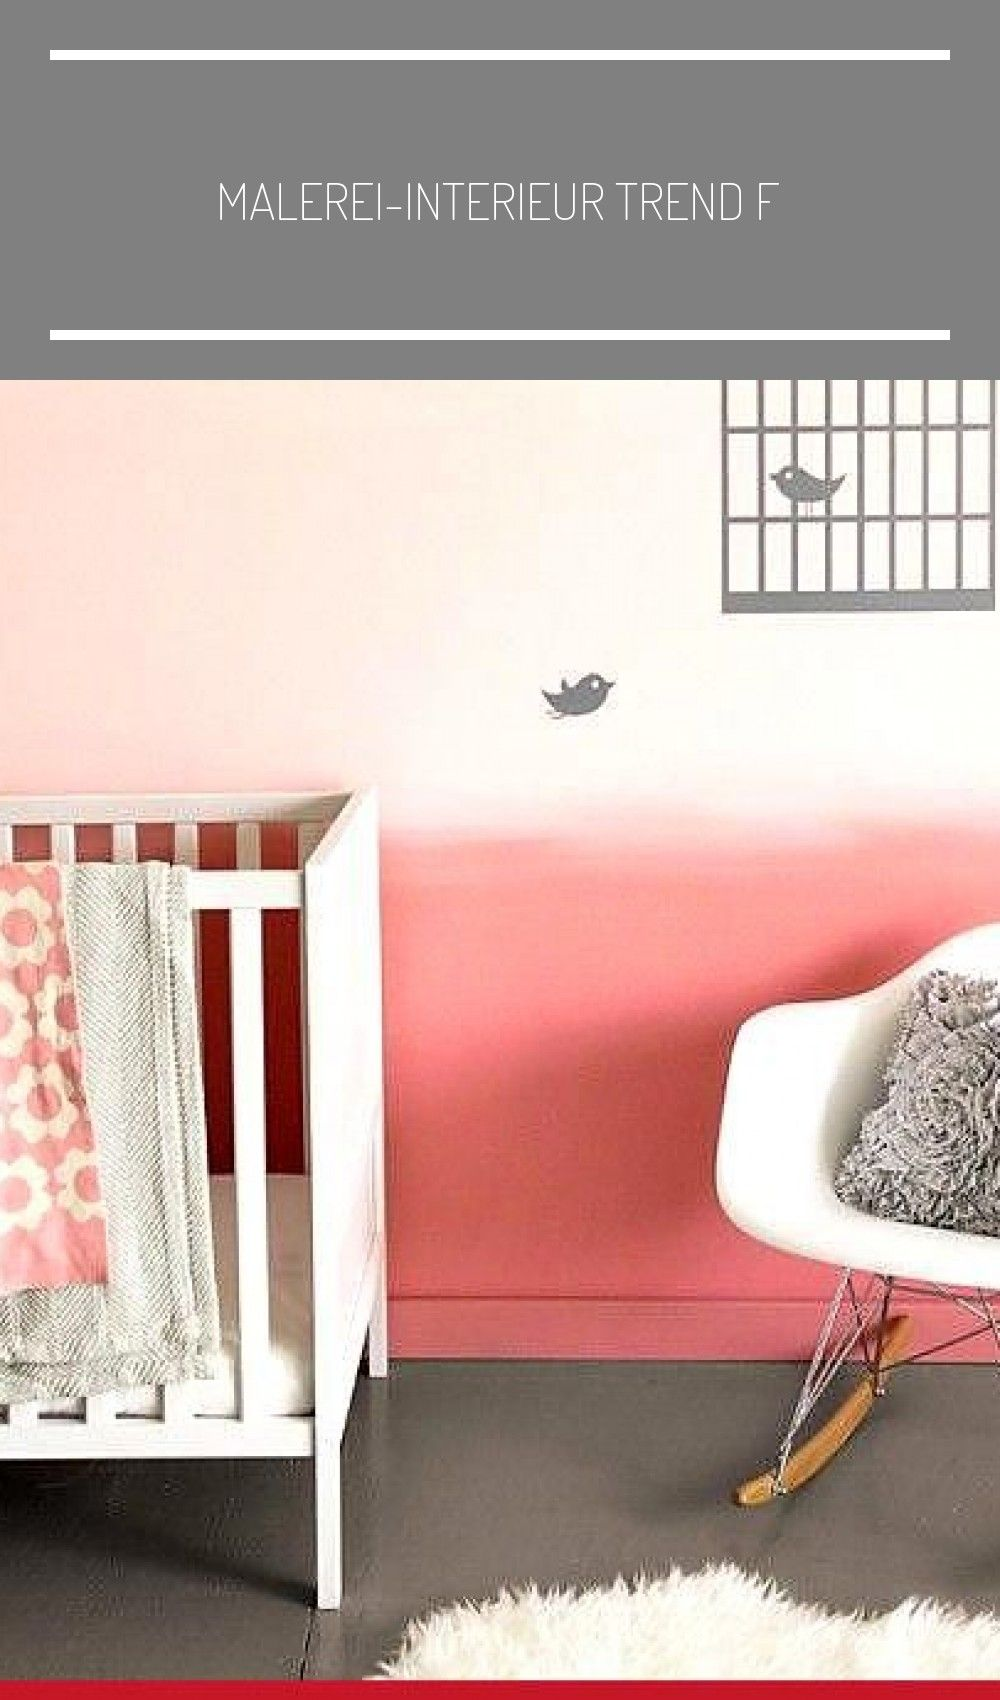 Malerei-Interieur Trend Farbverlauf Rosa Pastell Baby M dchen Zimmer meuble  pei...